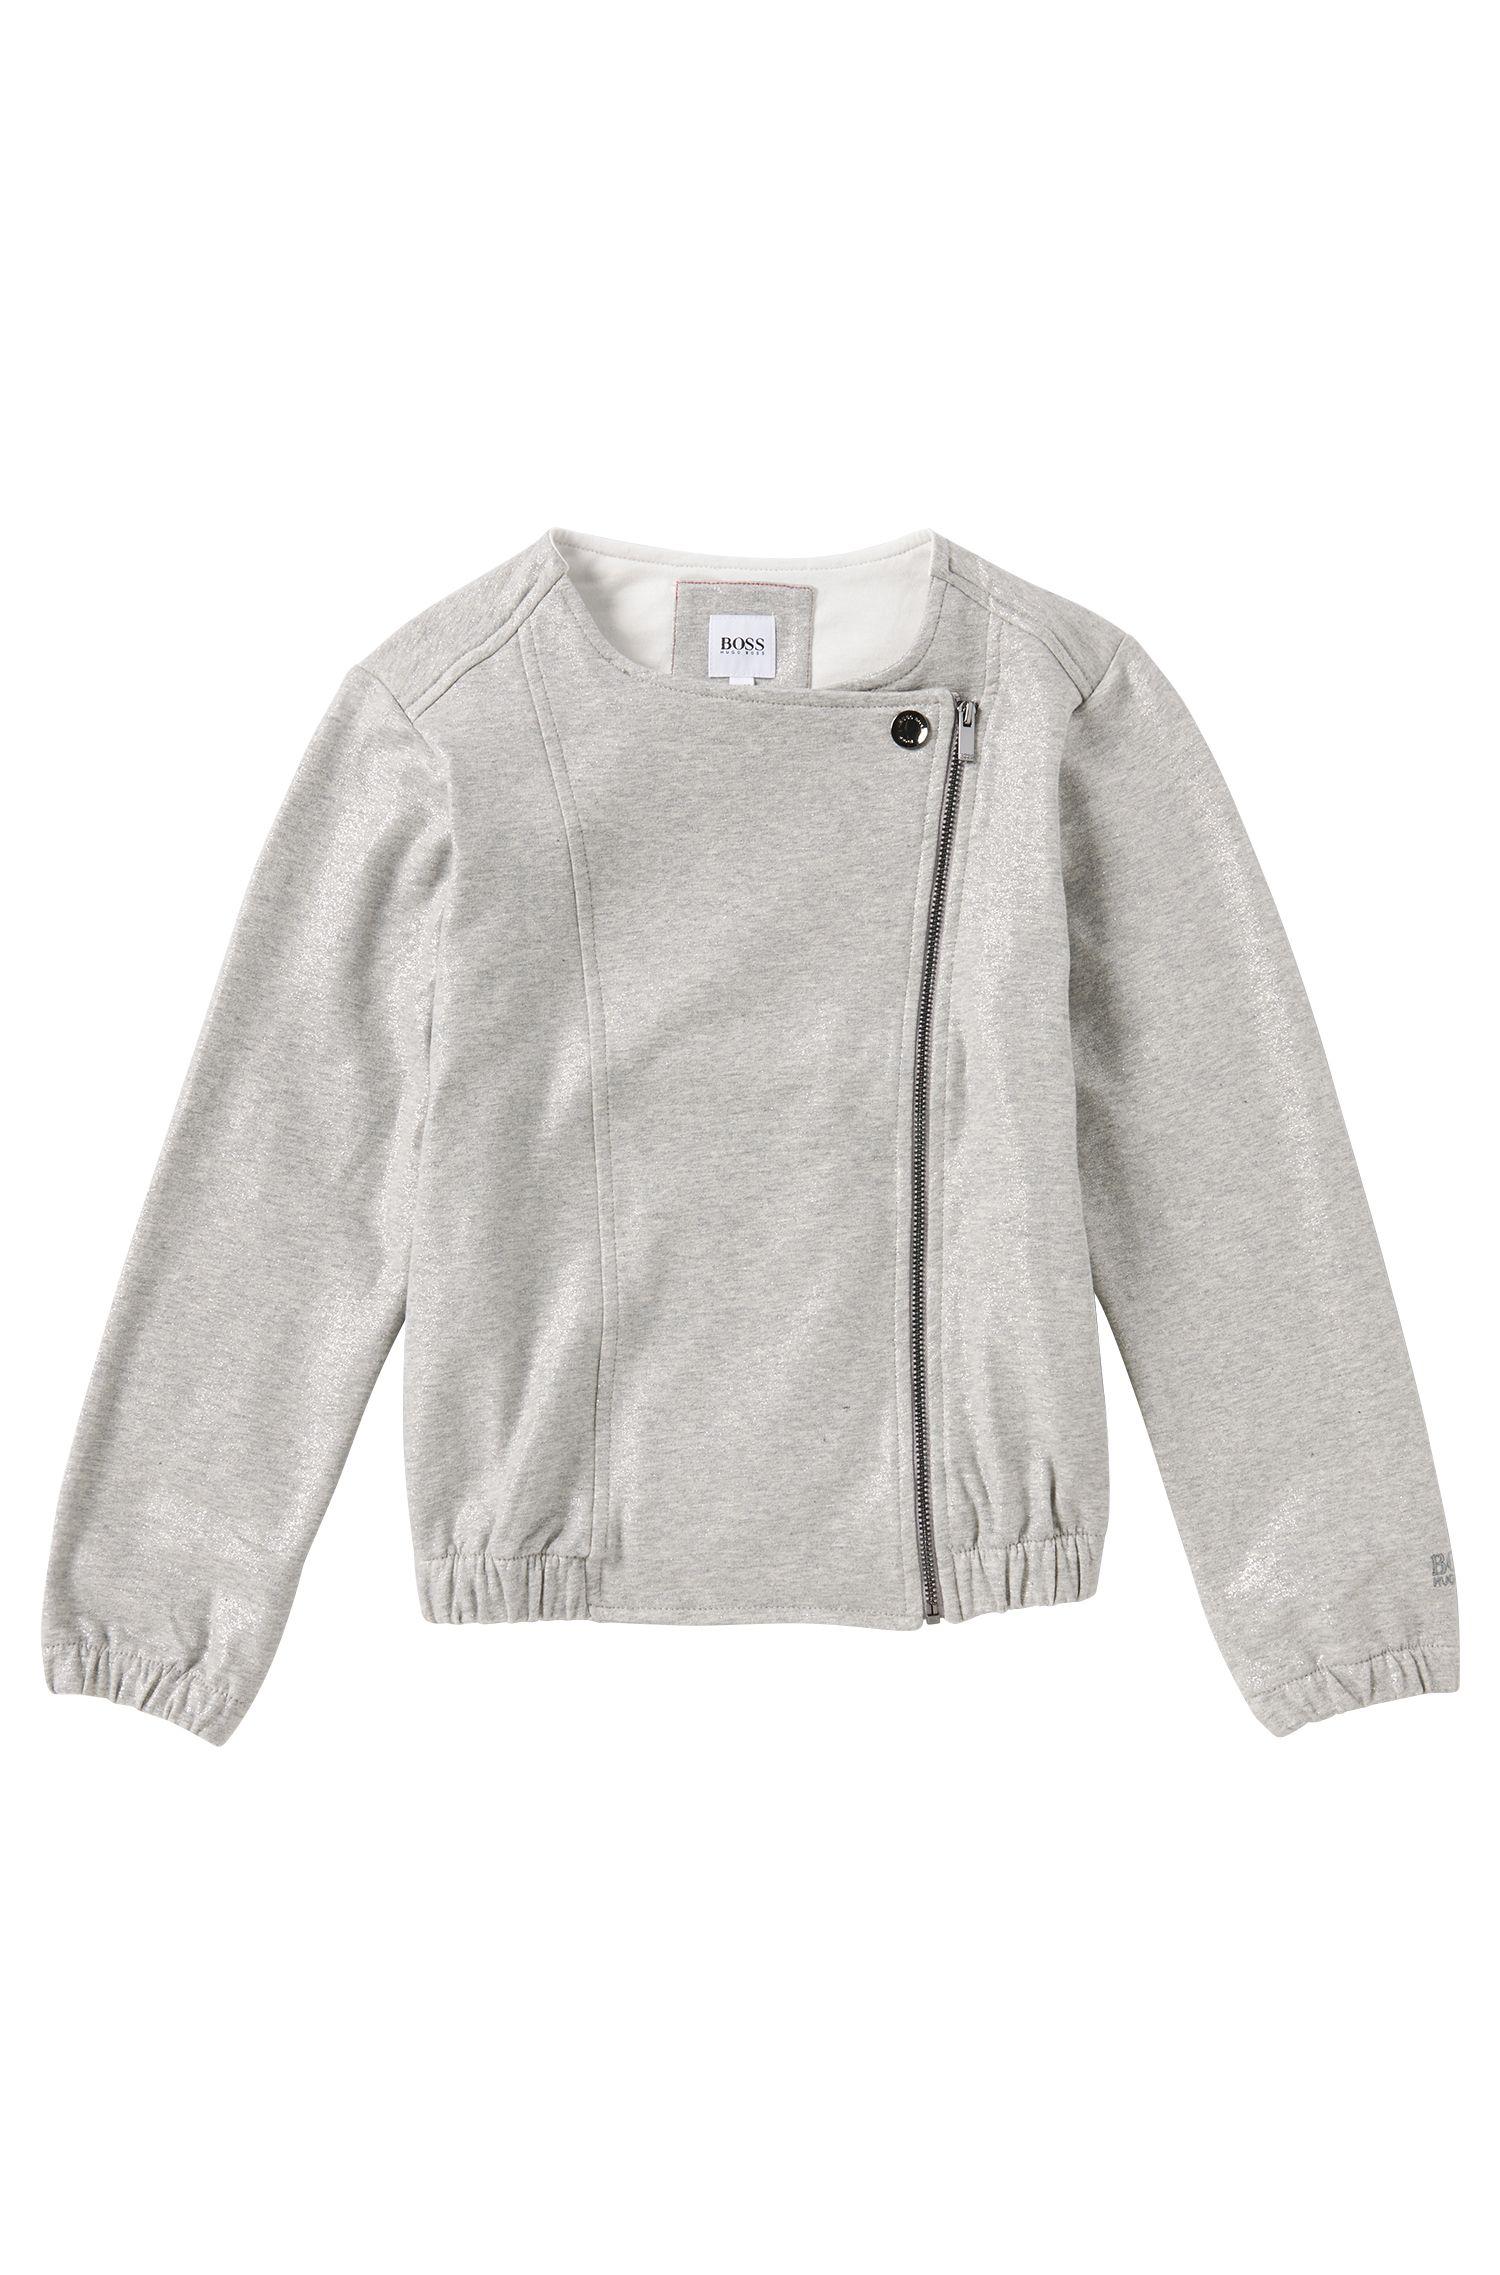 Kids Sweatshirt-Jacke aus Stretch-Baumwolle: 'J15320'